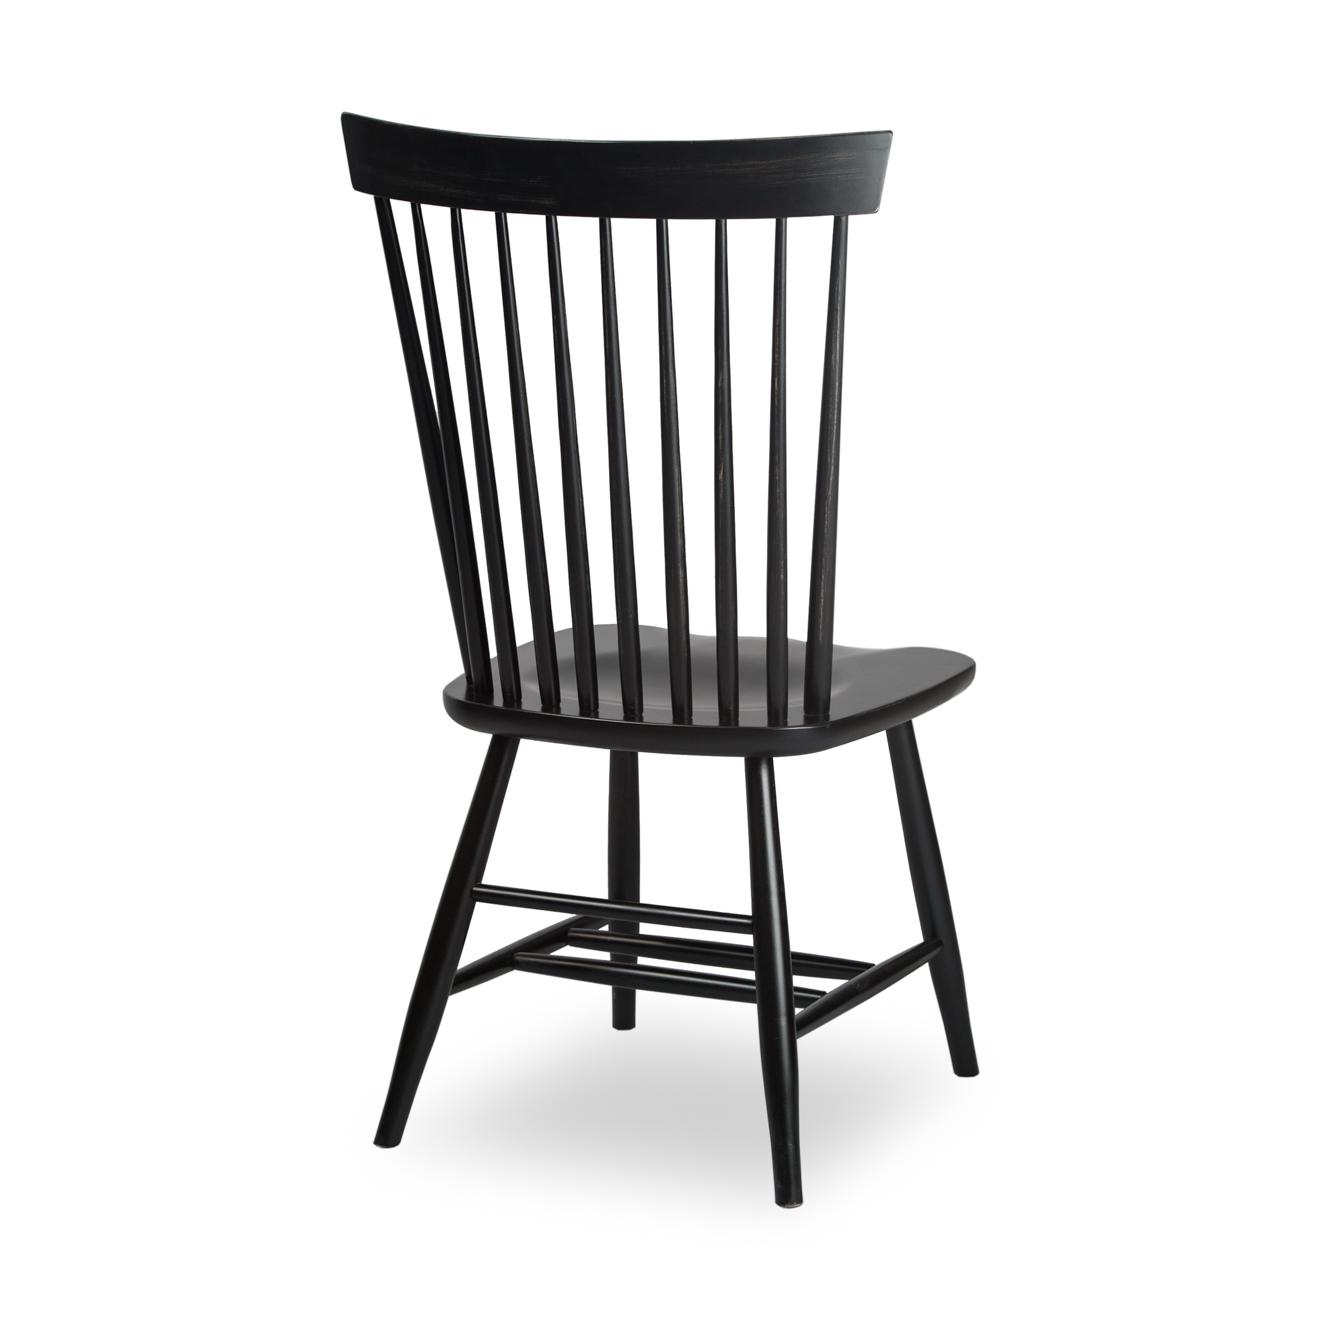 003_Woodcraft_Furniture_WindsorBentArrow_BckQtr-1.jpg